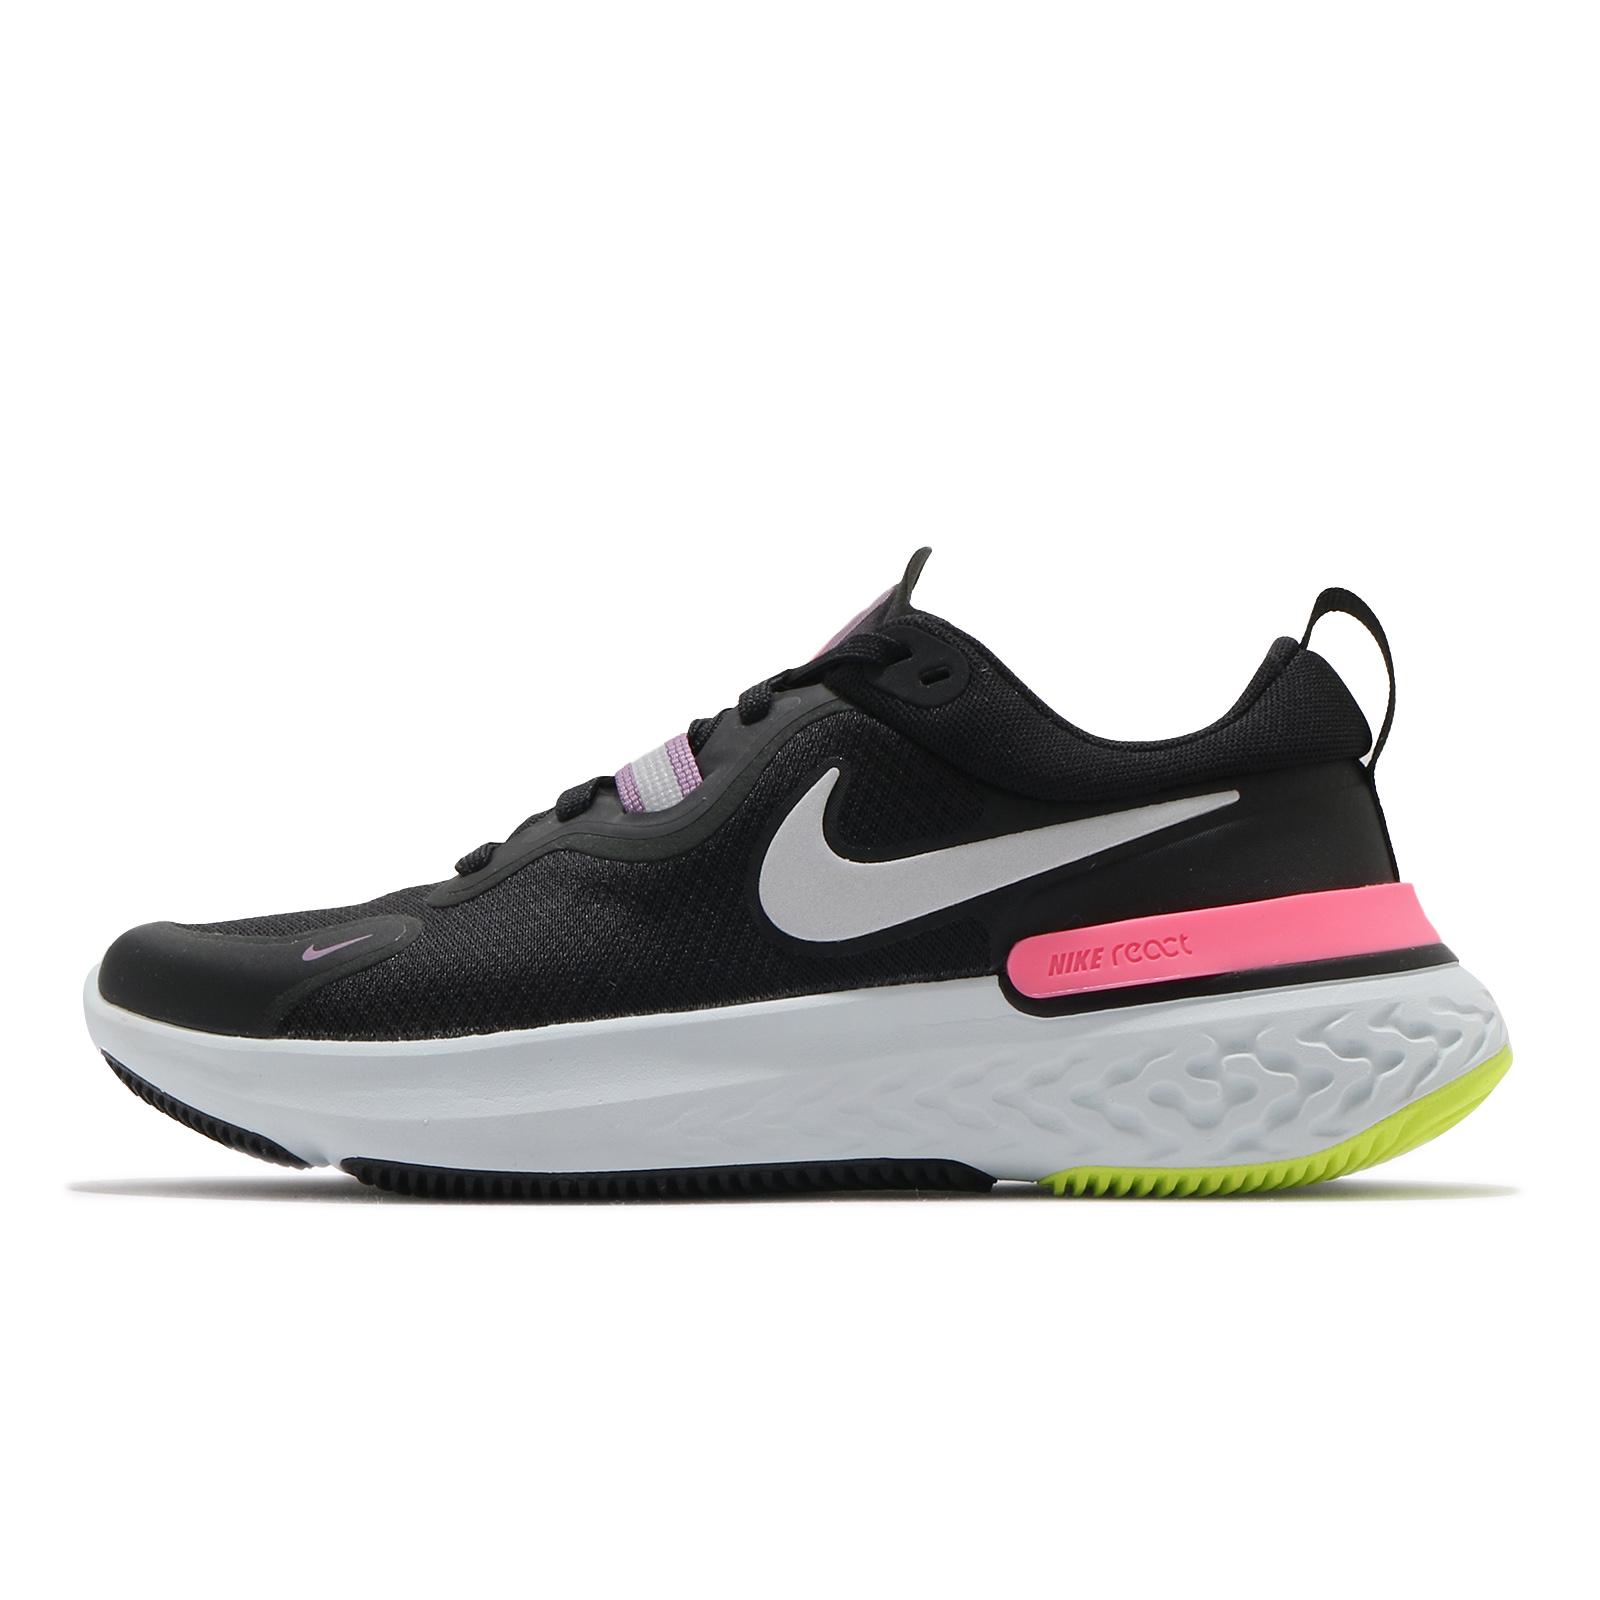 Nike 慢跑鞋 Wmns React Miler 黑 粉紅 女鞋 發泡中底 運動鞋【ACS】 CW1778-012